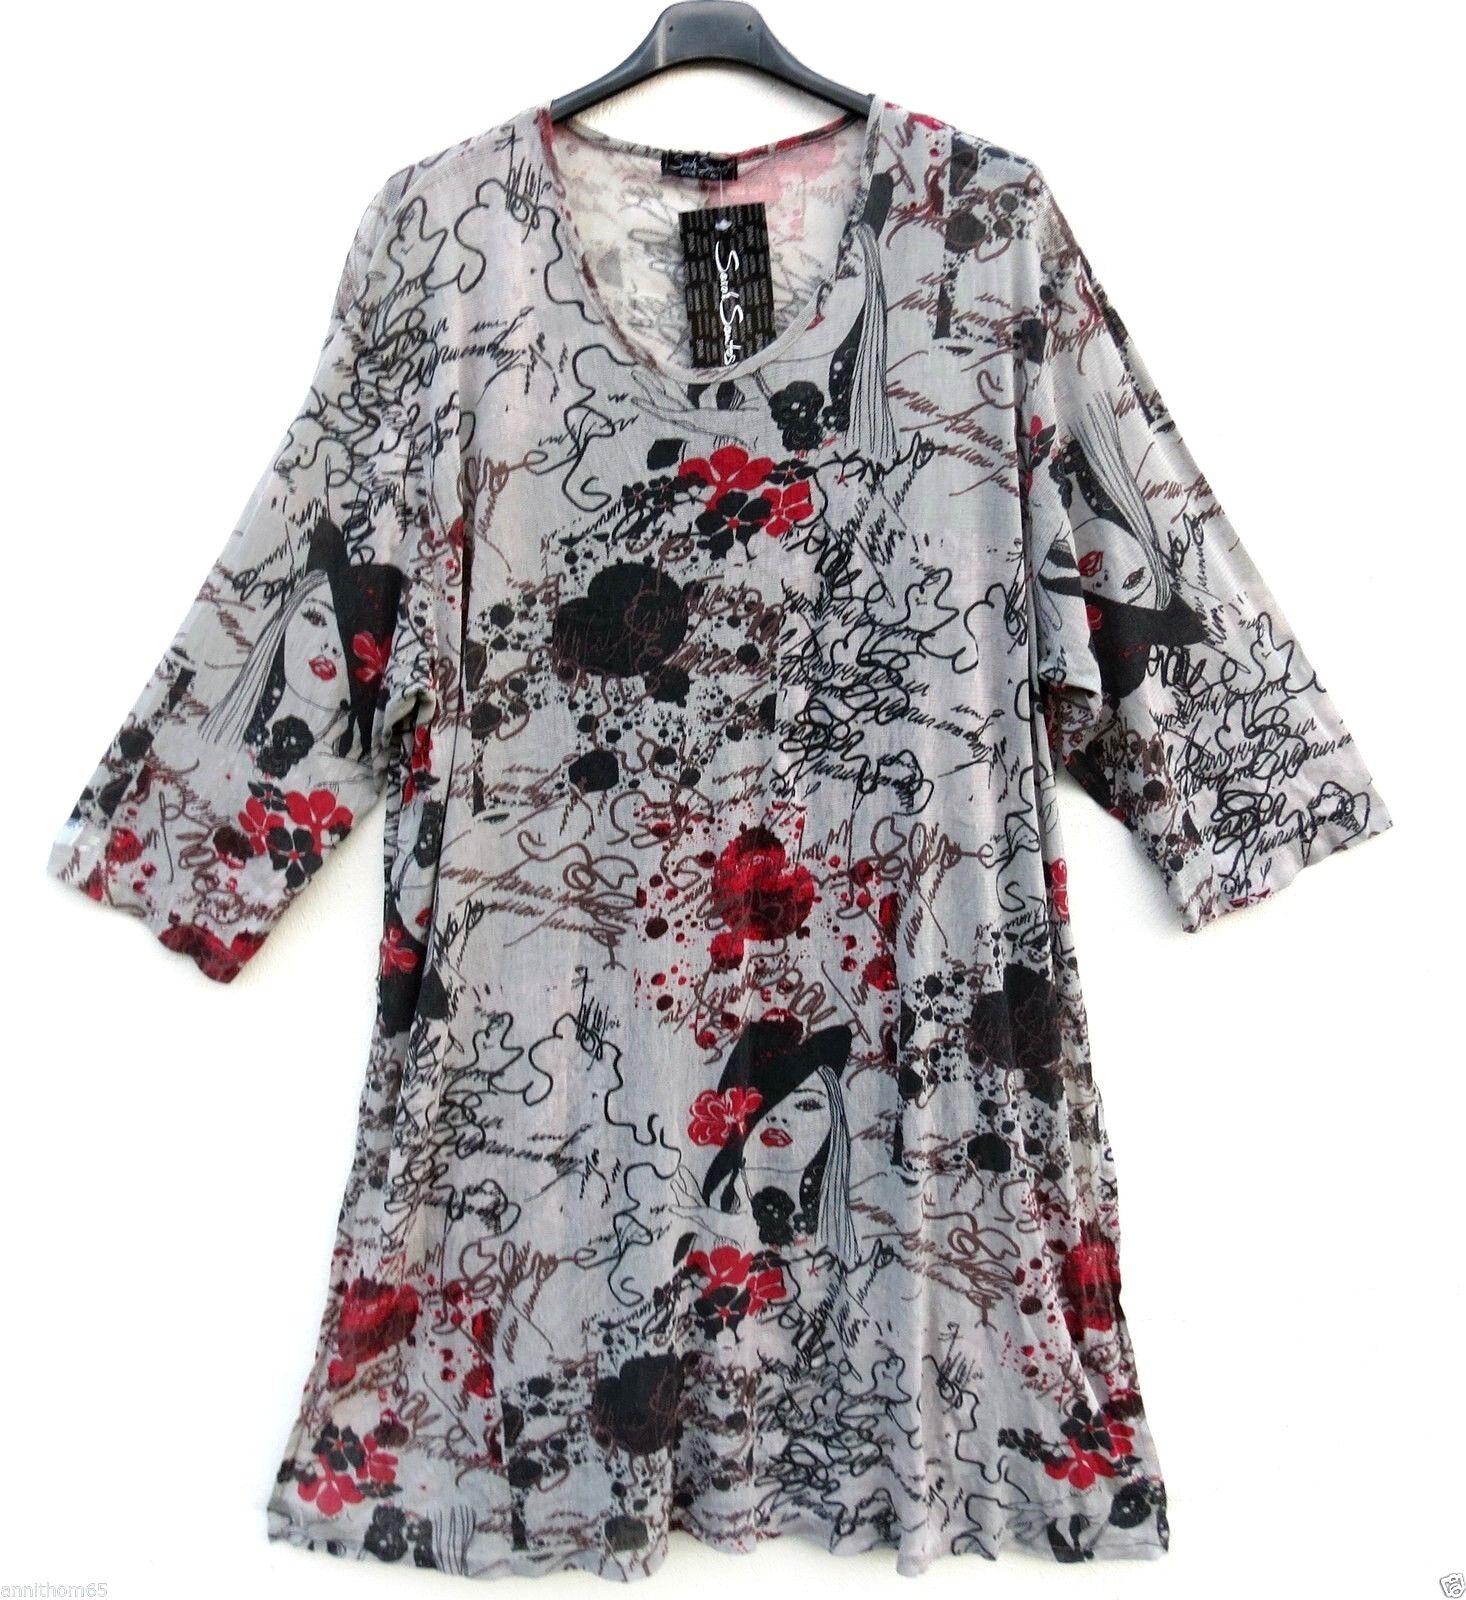 SARAH SANTOS Sommer Tunika Shirt Tunic Tunique Tunica XL 48 50 Lagenlook